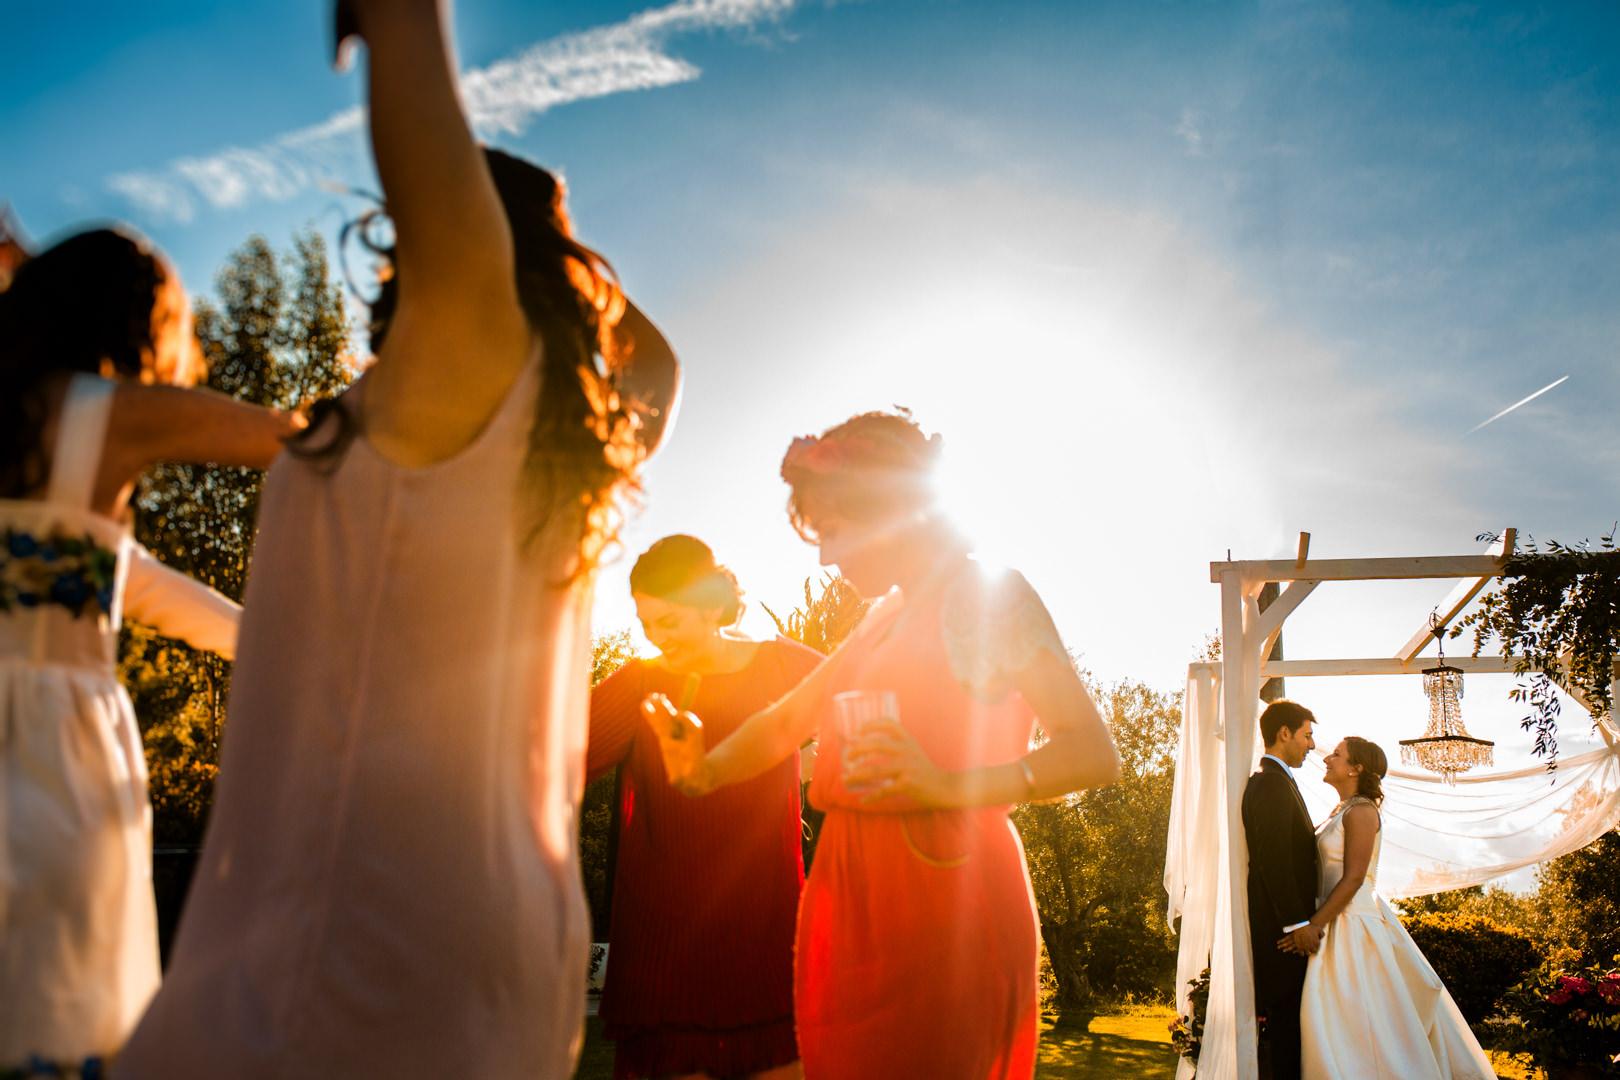 Preboda-Madrid-Maria-David-engagement-Rafael-Torres-fotografo-bodas-sevilla-madrid-barcelona-wedding-photographer--2.jpg